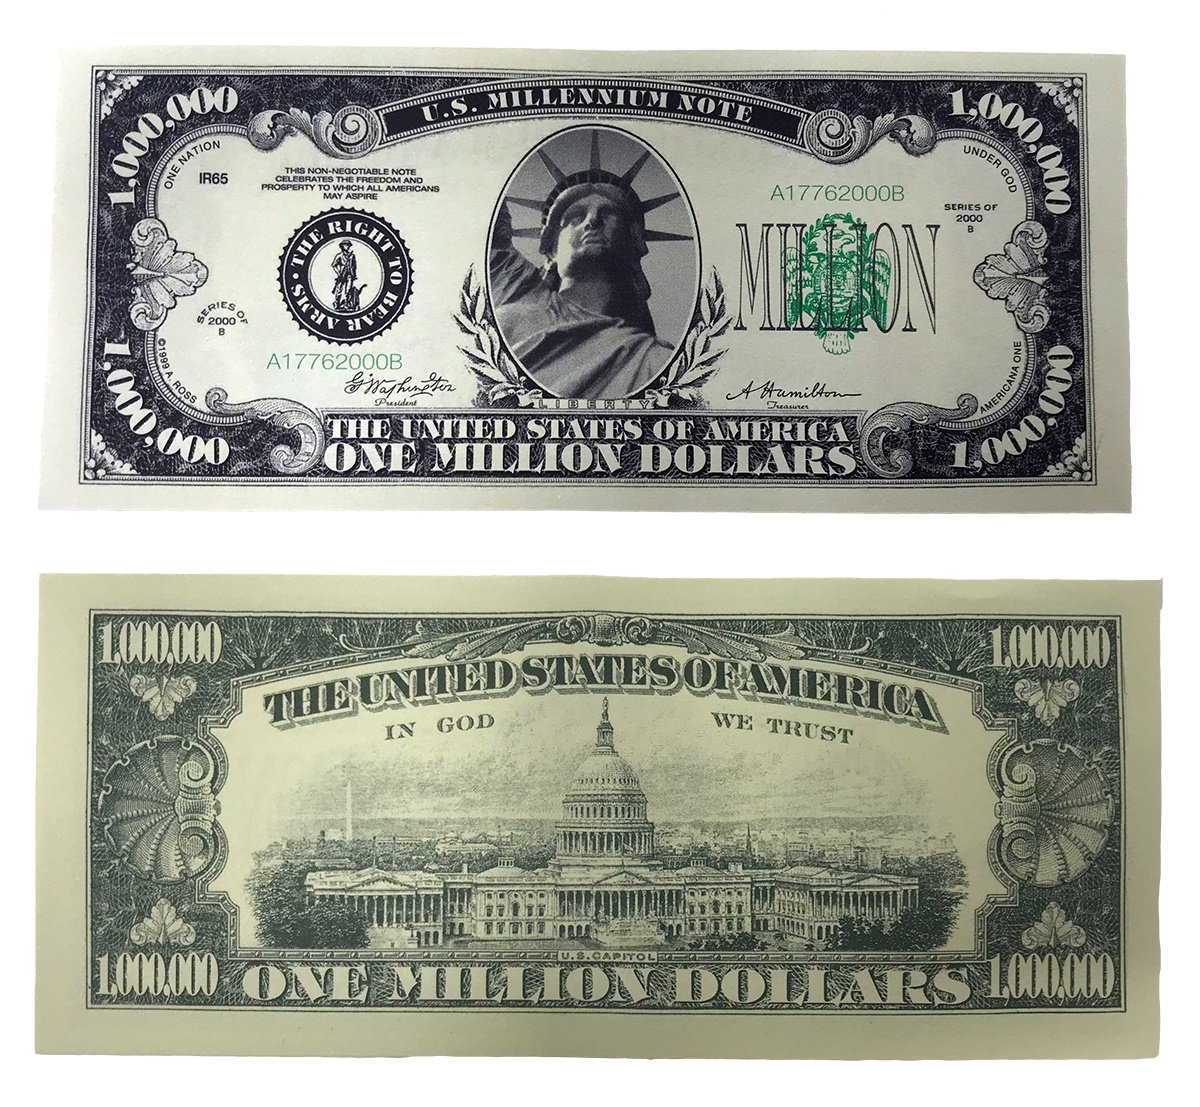 TheGag Million Dollar Bills- 100 Bills Very Realistic Looking Prop Money Copy -Educational Product-Play Money-Millones De Billetes Dinero Falso by TheGag